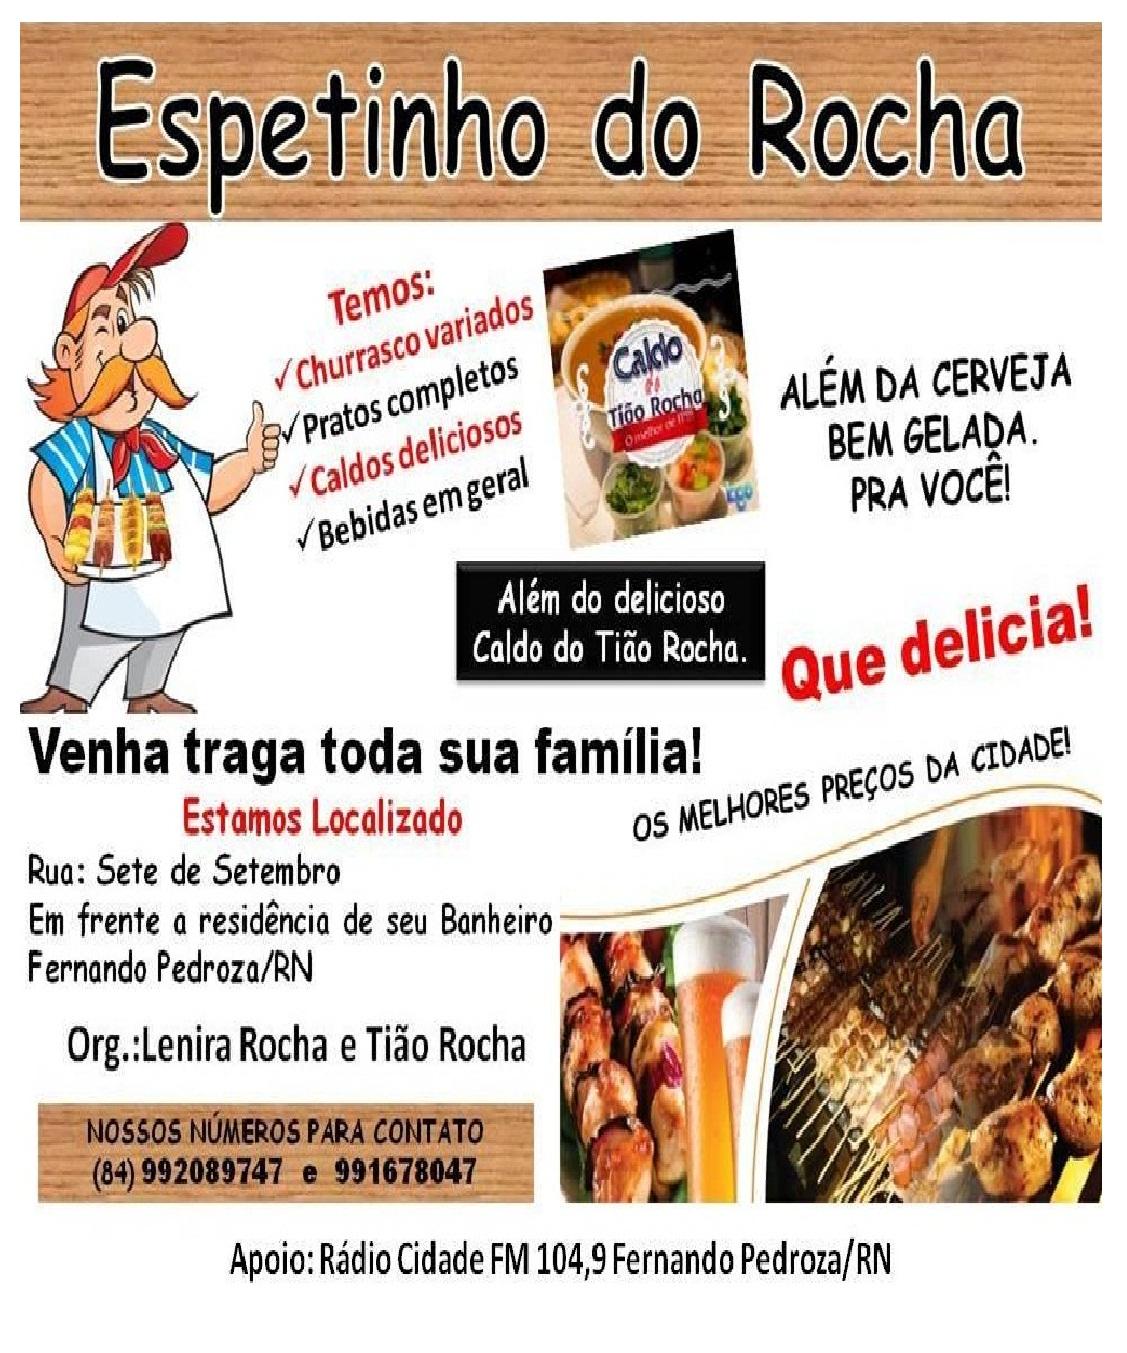 ESPETINHO DO ROCHA F PEDROZA RN